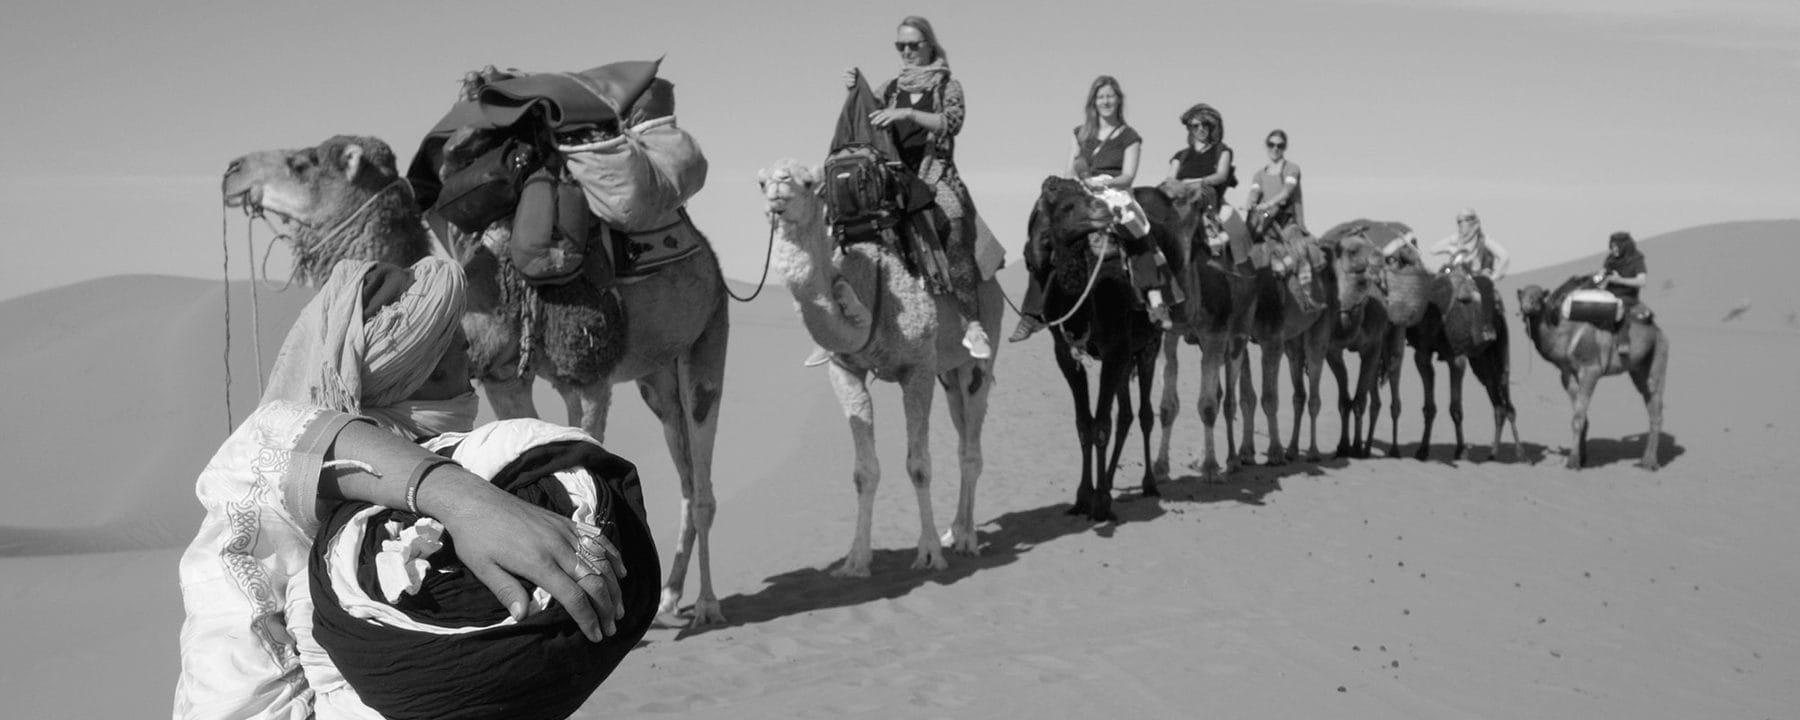 morocco-round-trip-yoga-retreats_source-nosade